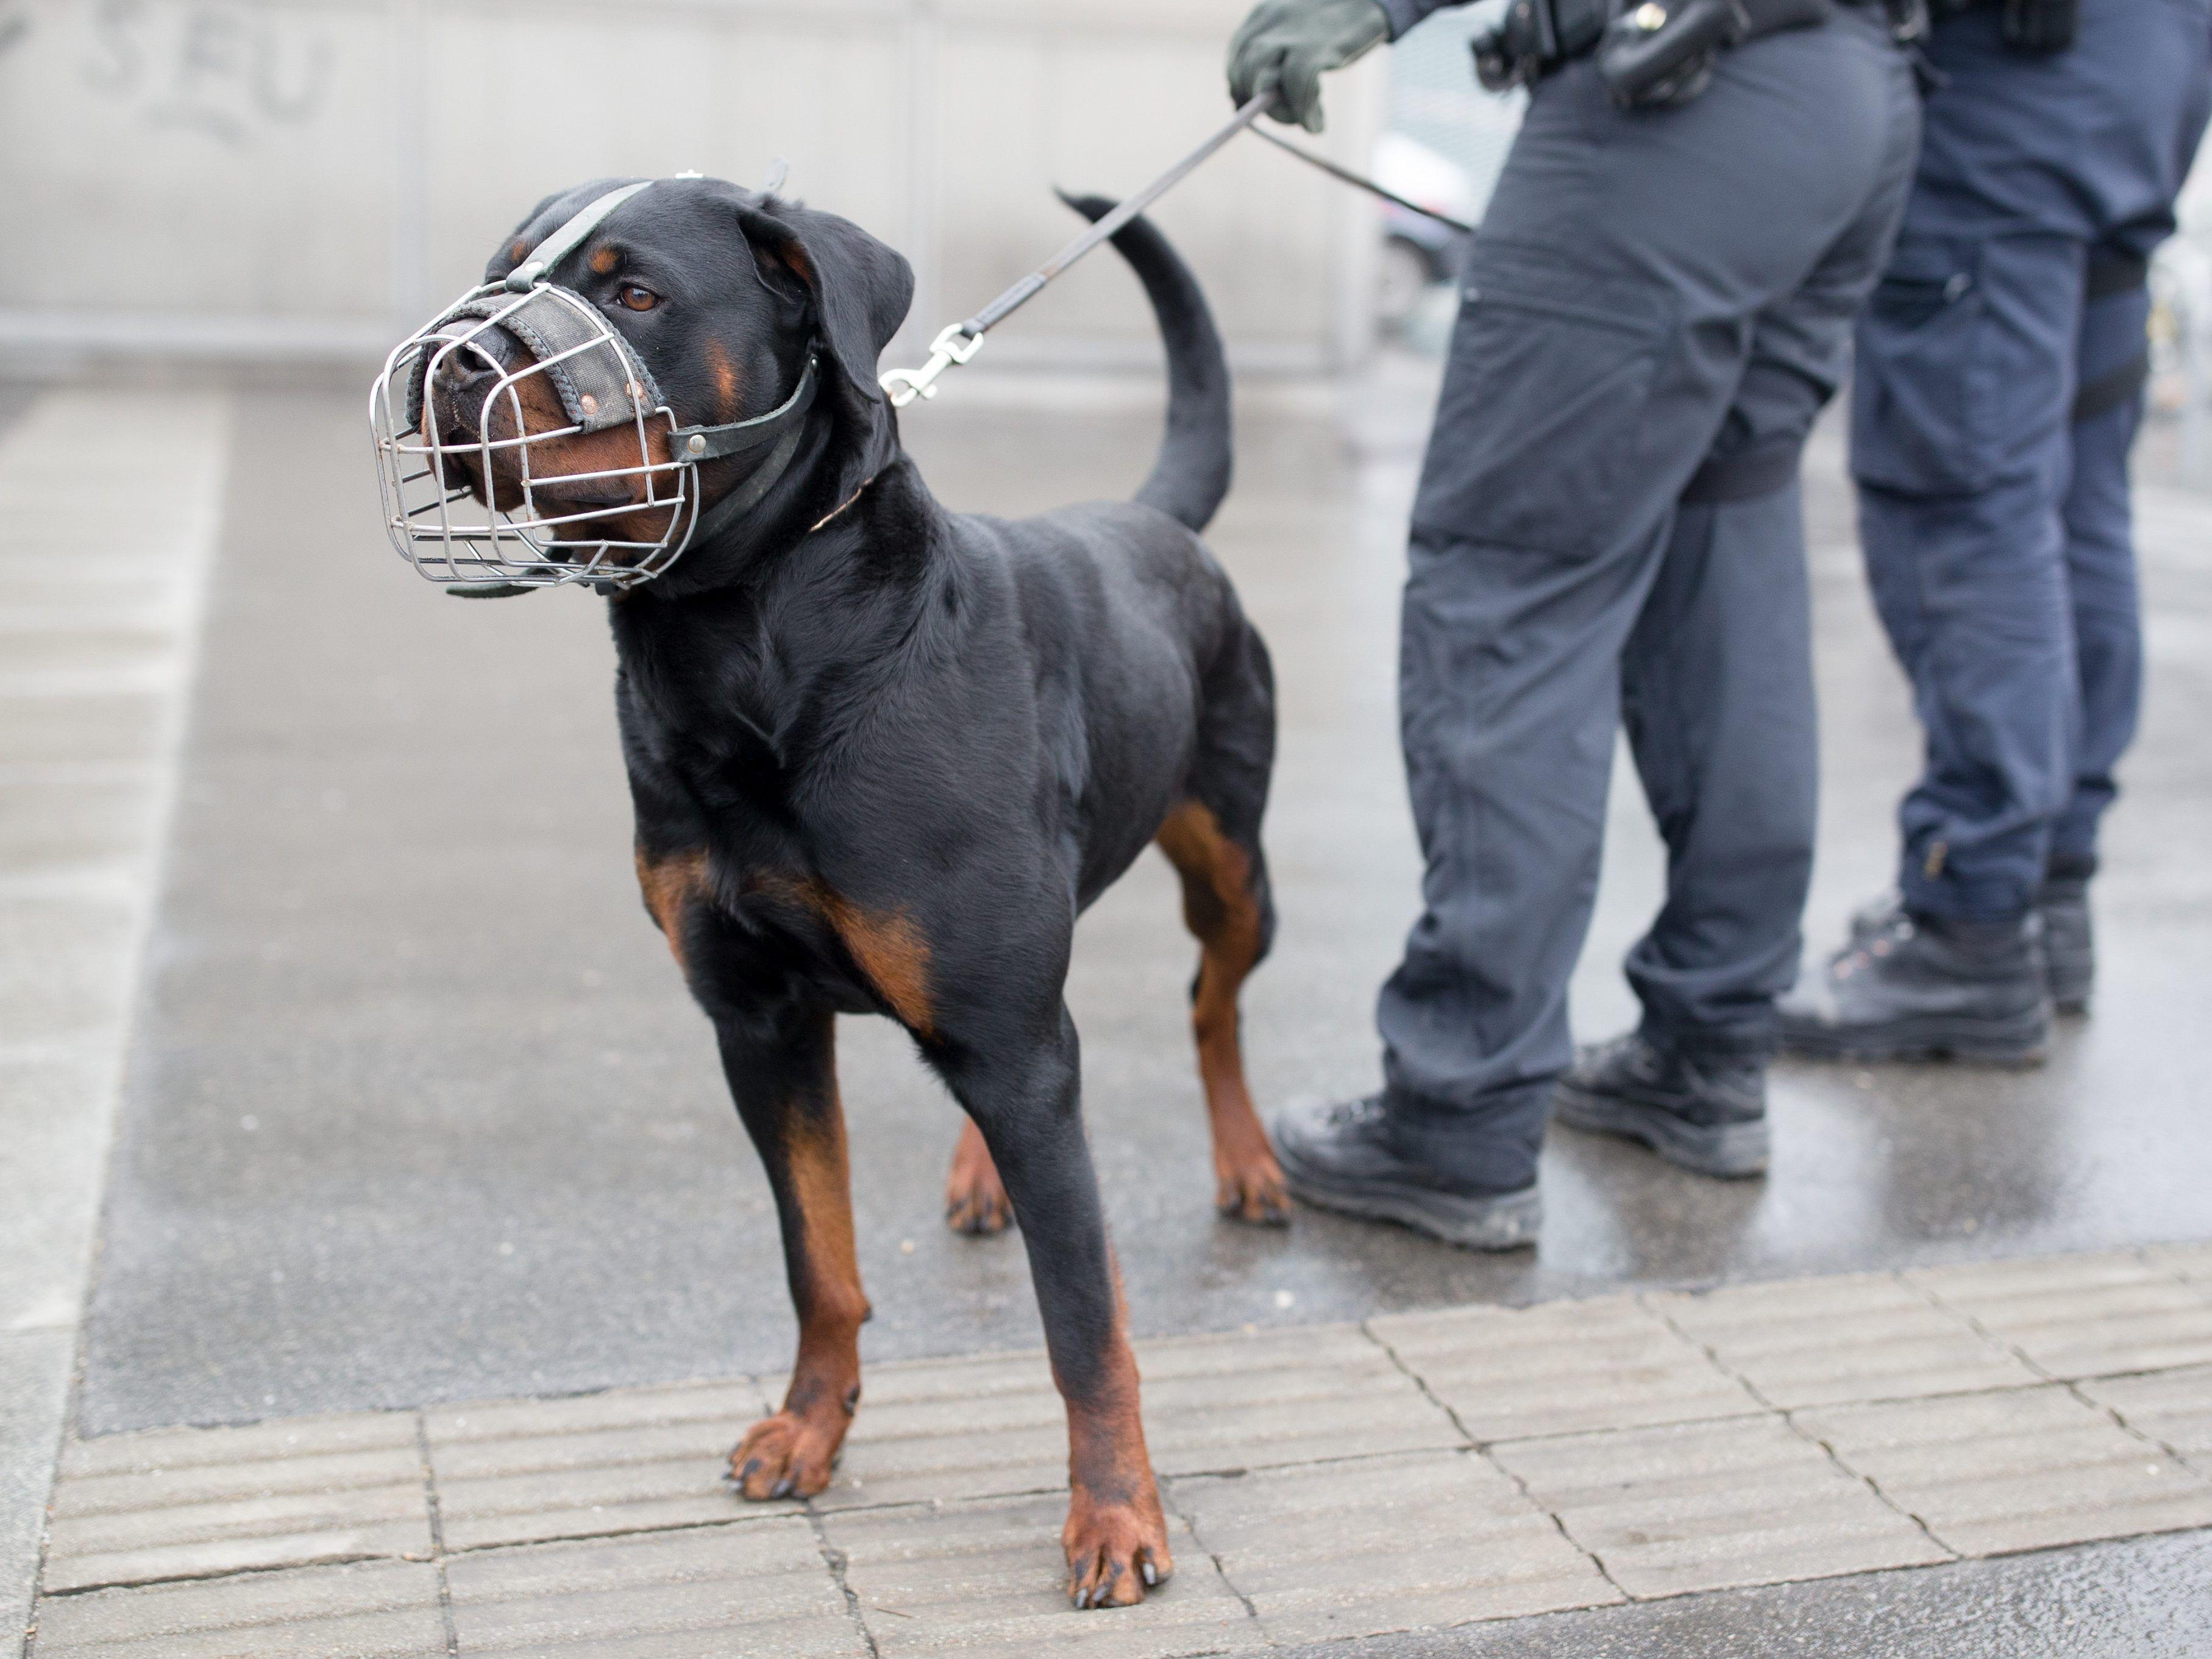 Drogendealer bei Schwerpunktaktion in Wien festgenommen 7a10b1ba148